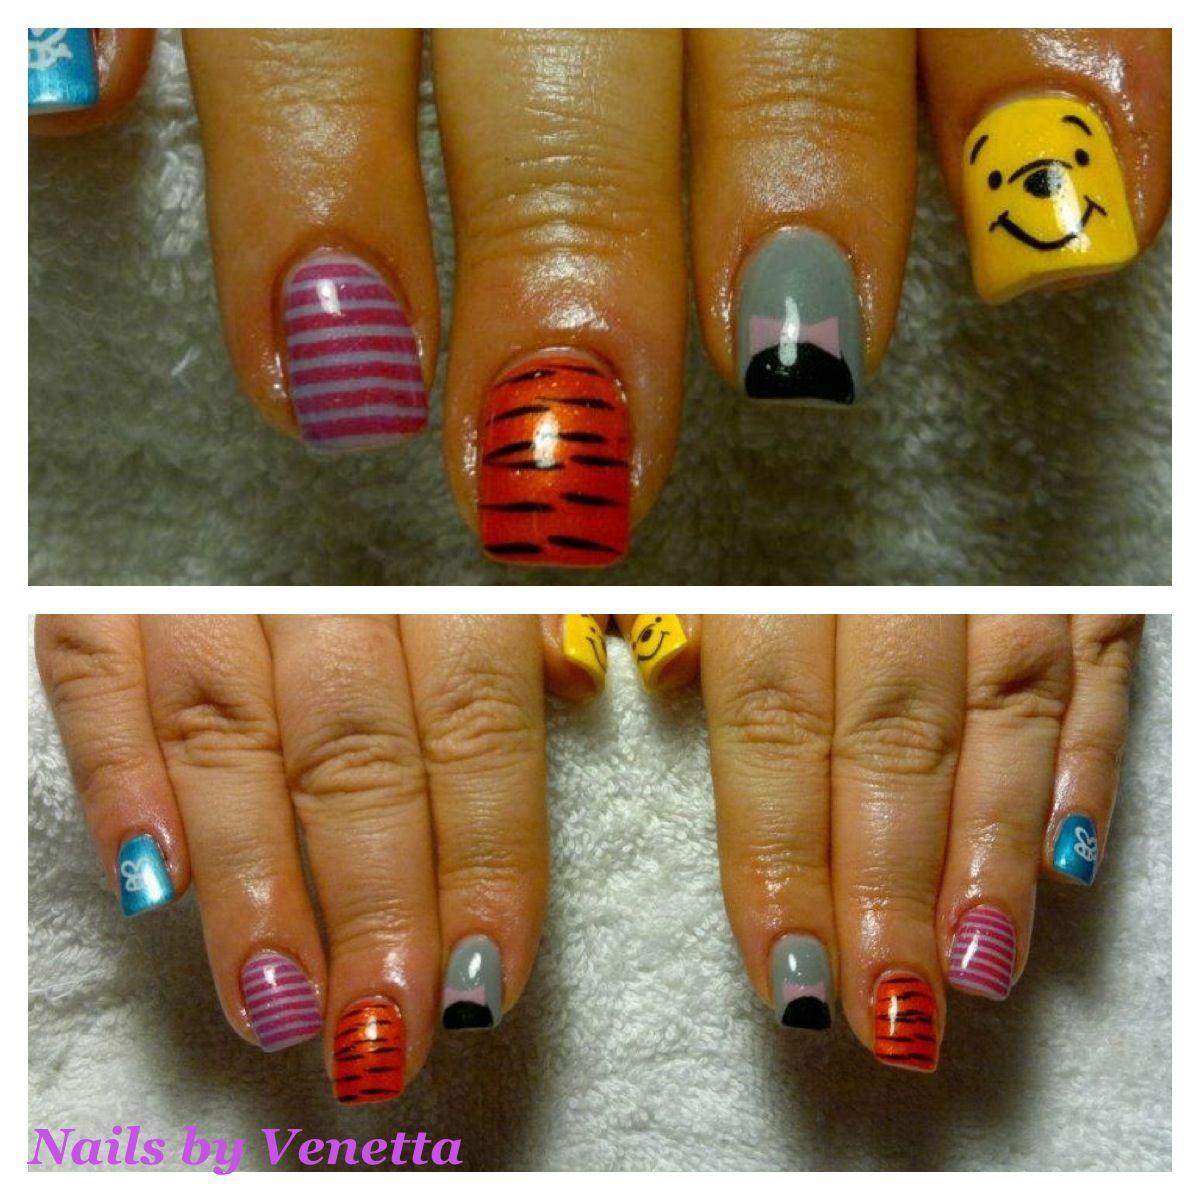 Winnie the Pooh Nails | Acrylic - Nails by Venetta | Pinterest ...